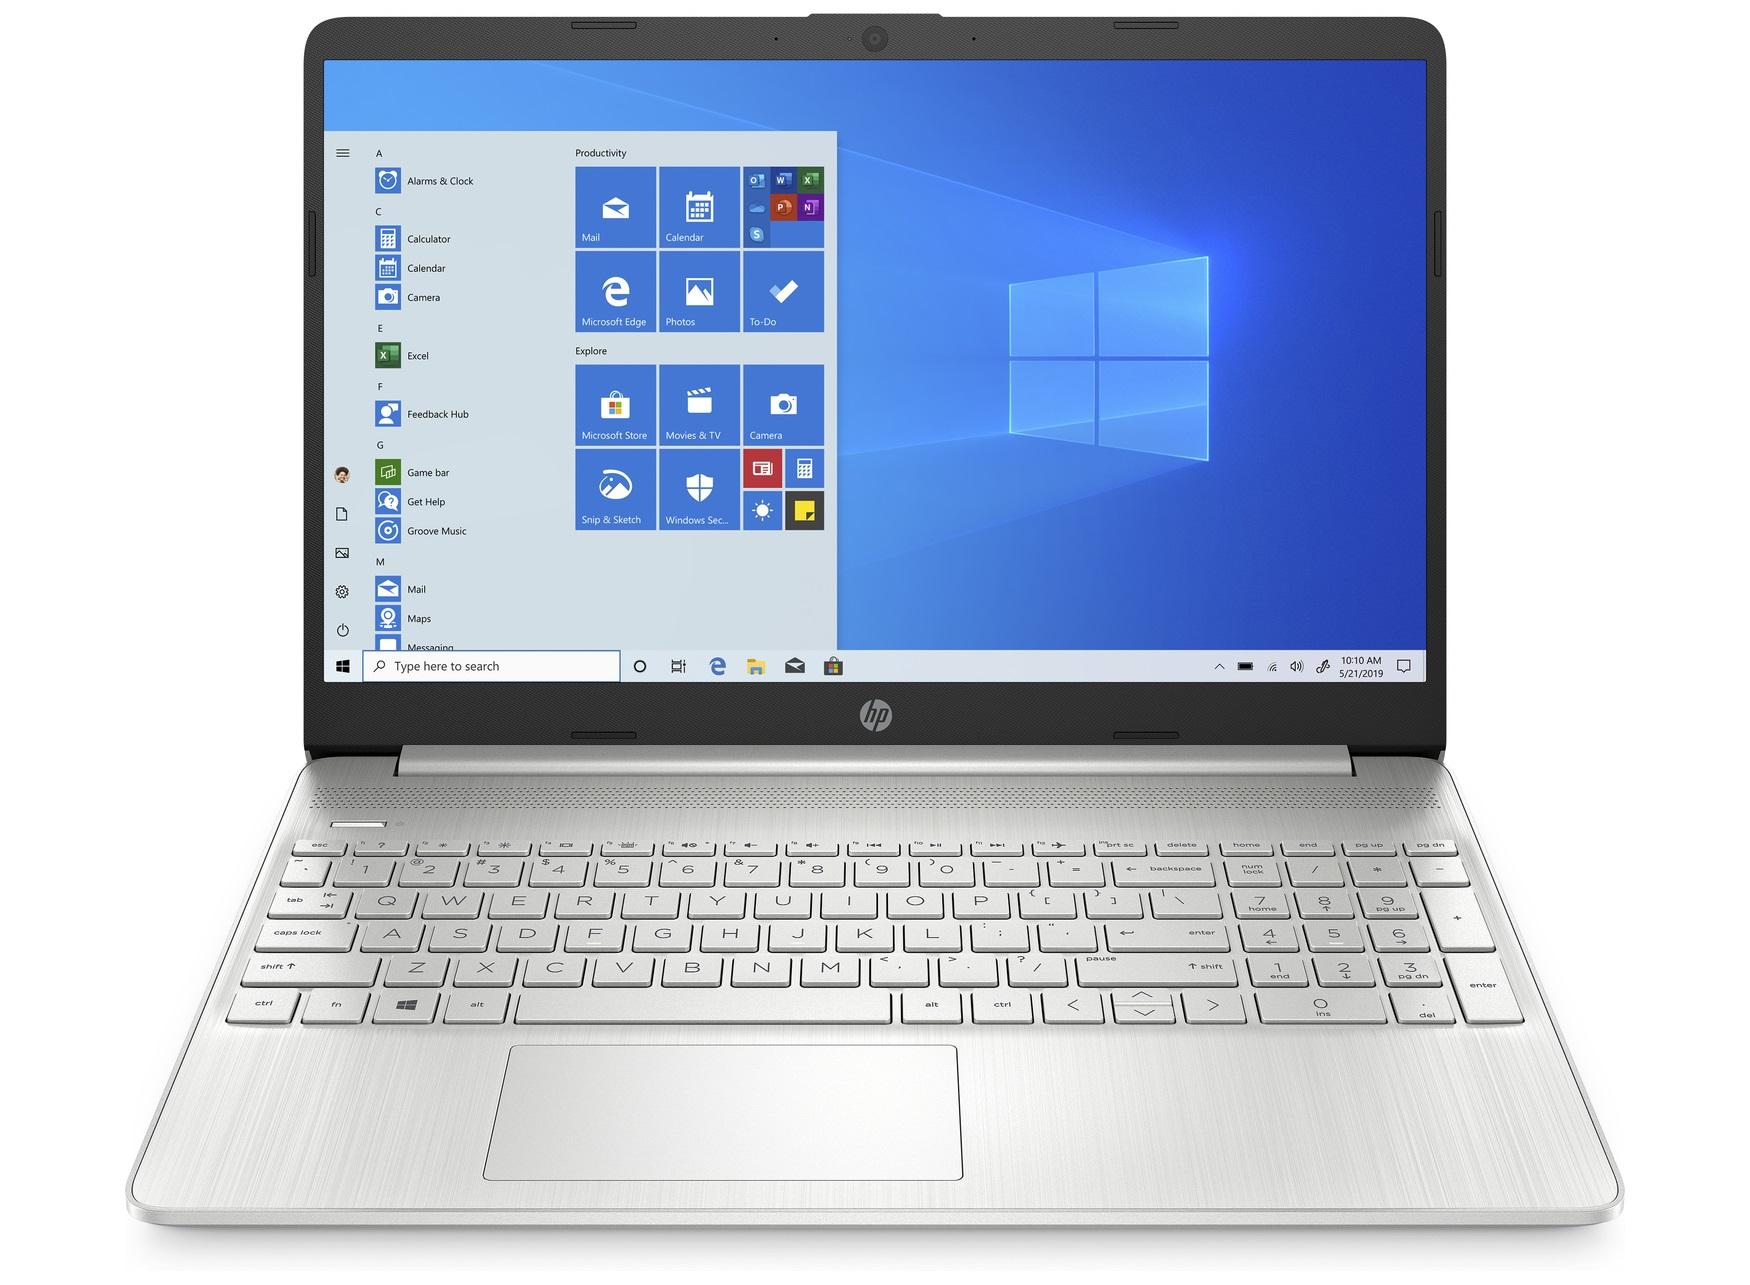 HP 15s-eq1125nd, 15.6 Full HD, AMD Ryzen 3 3250U, 2.6 GHz, 8 GB RAM, 256 GB SSD NVMe, AMD Radeon Graphics